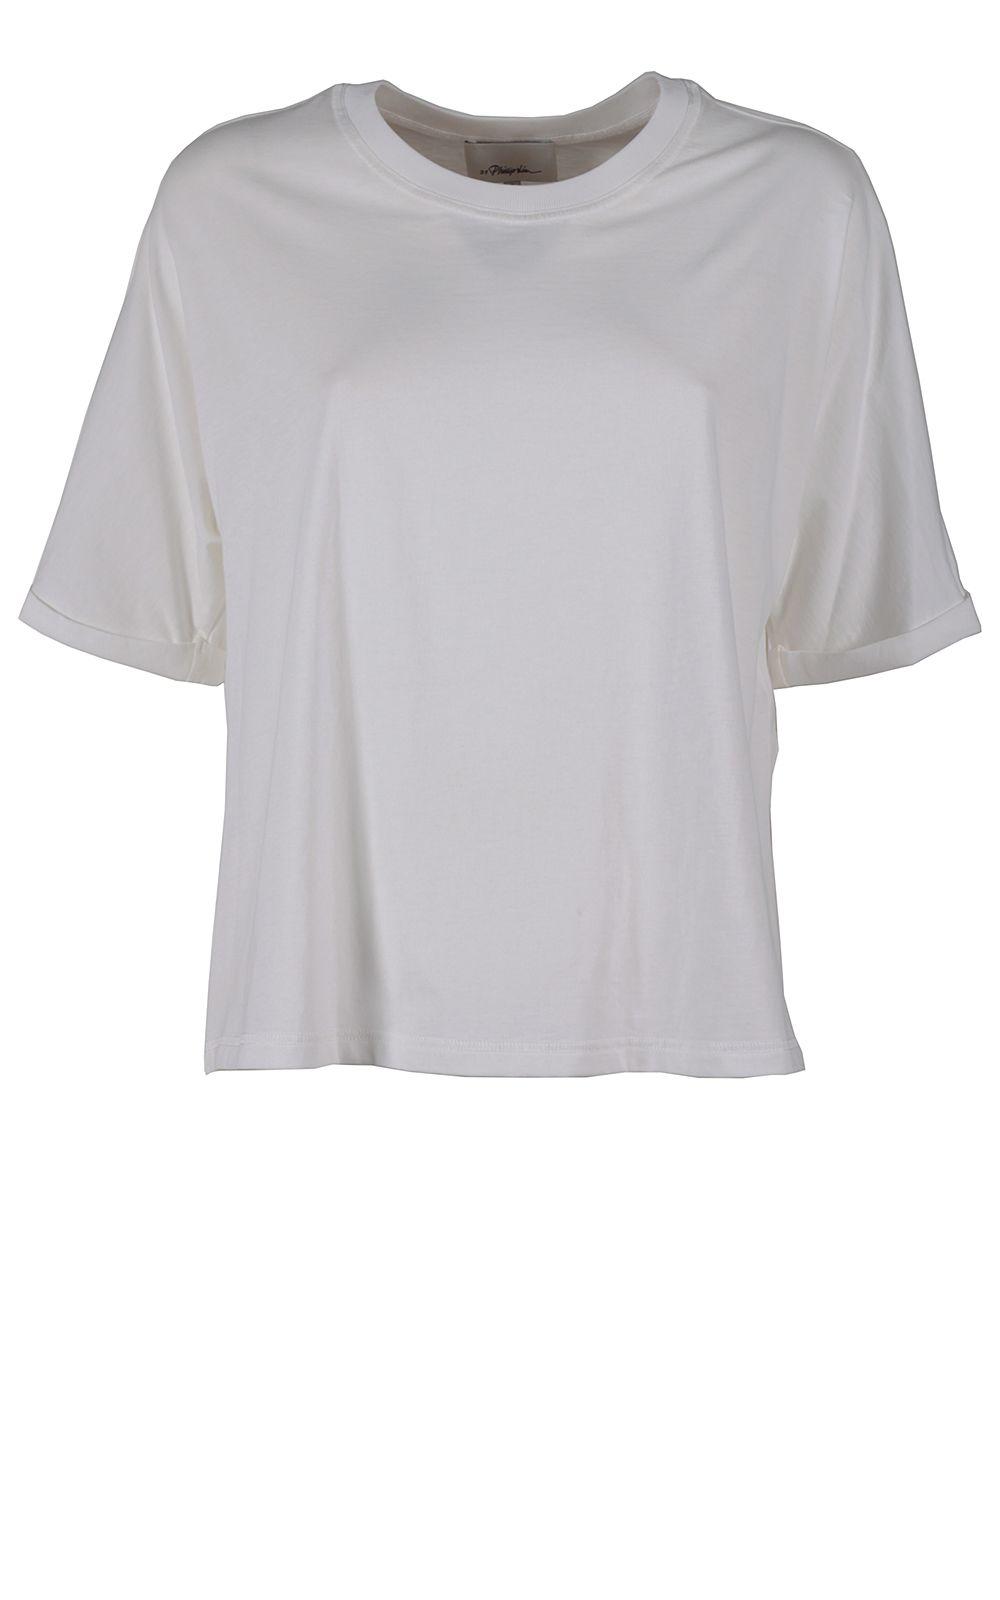 3.1 Phillip Lim Silk And Cotton T-shirt